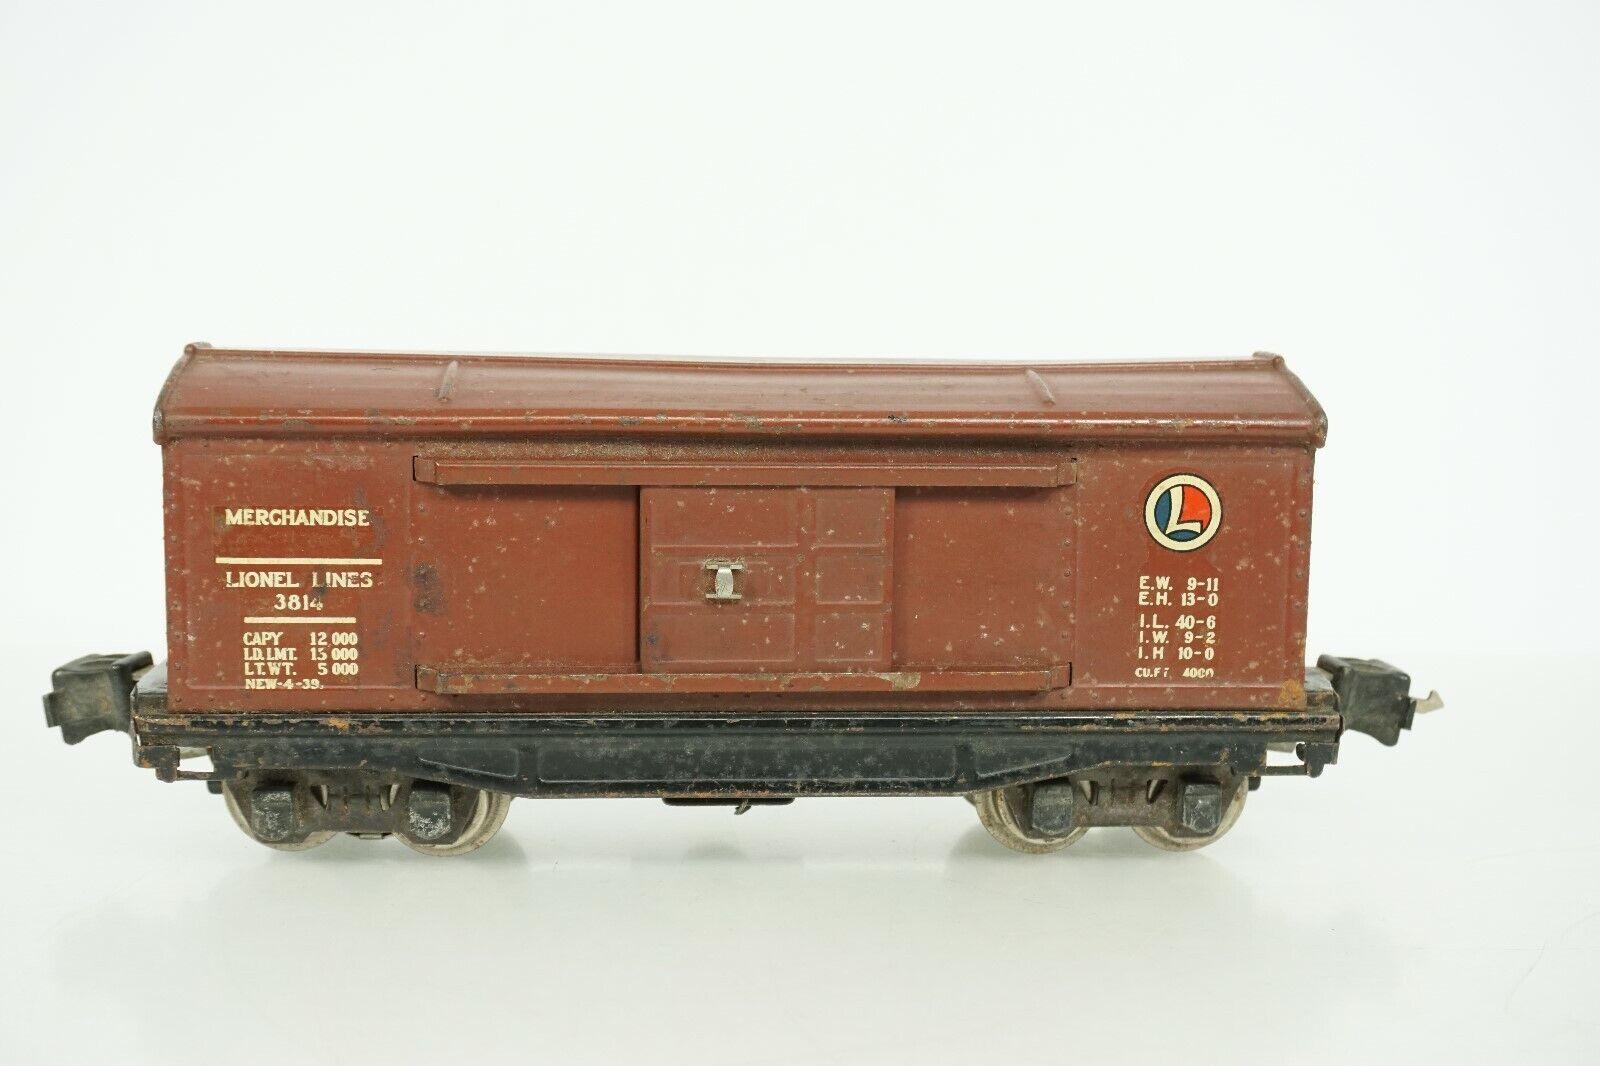 Raro líneas de Lionel o escala preguerra mercancía de funcionamiento 3814 coche de caja